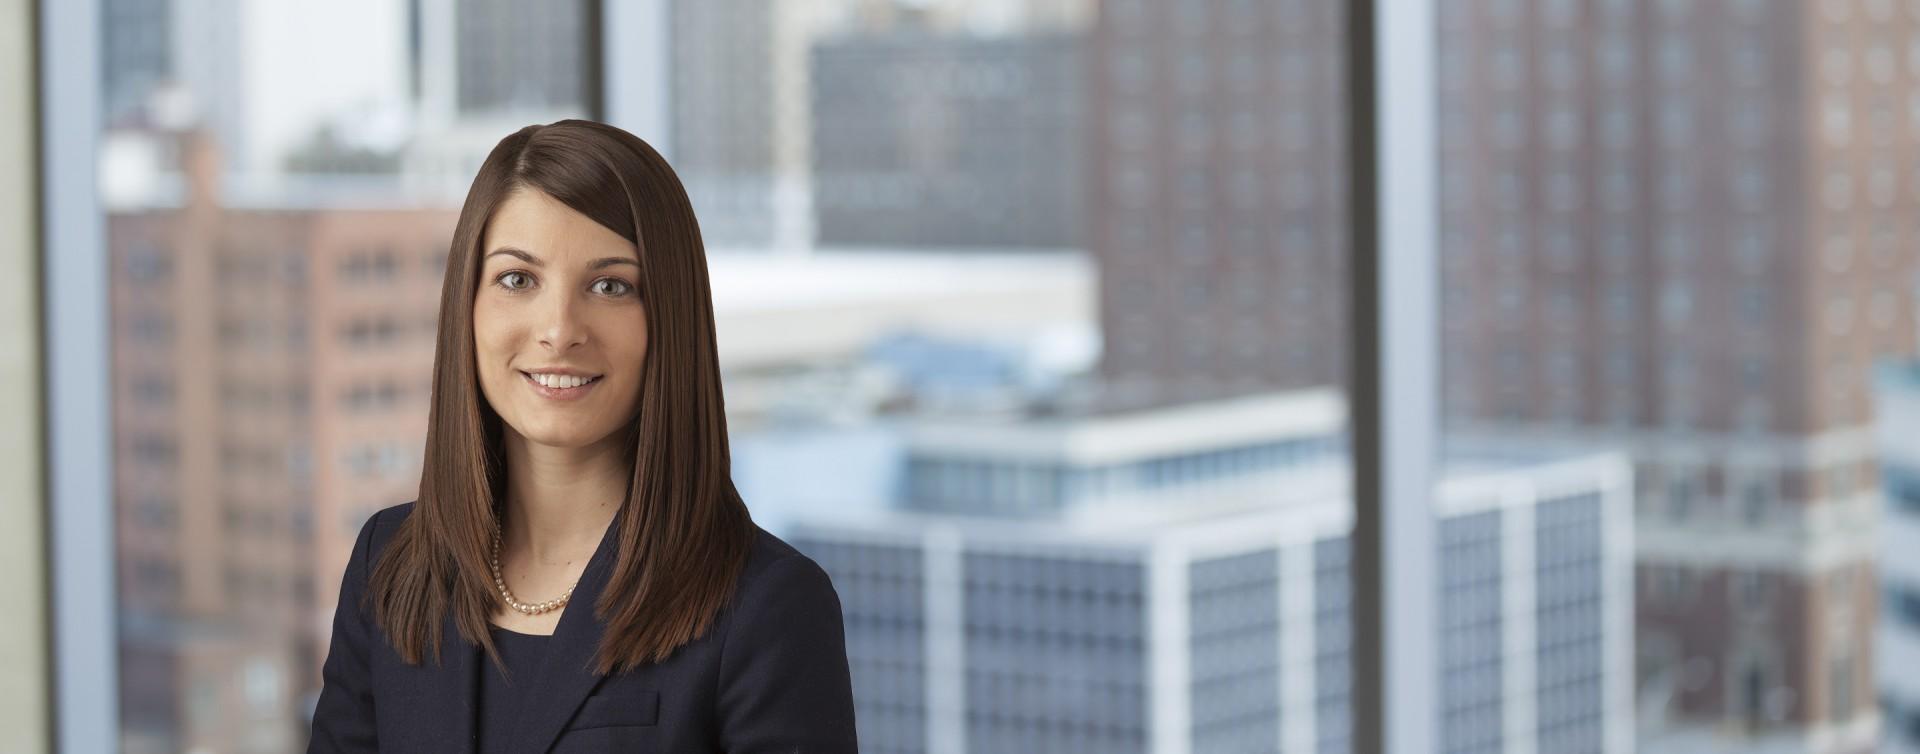 Riane Lafferty Labor And Employment Lawyer Bond